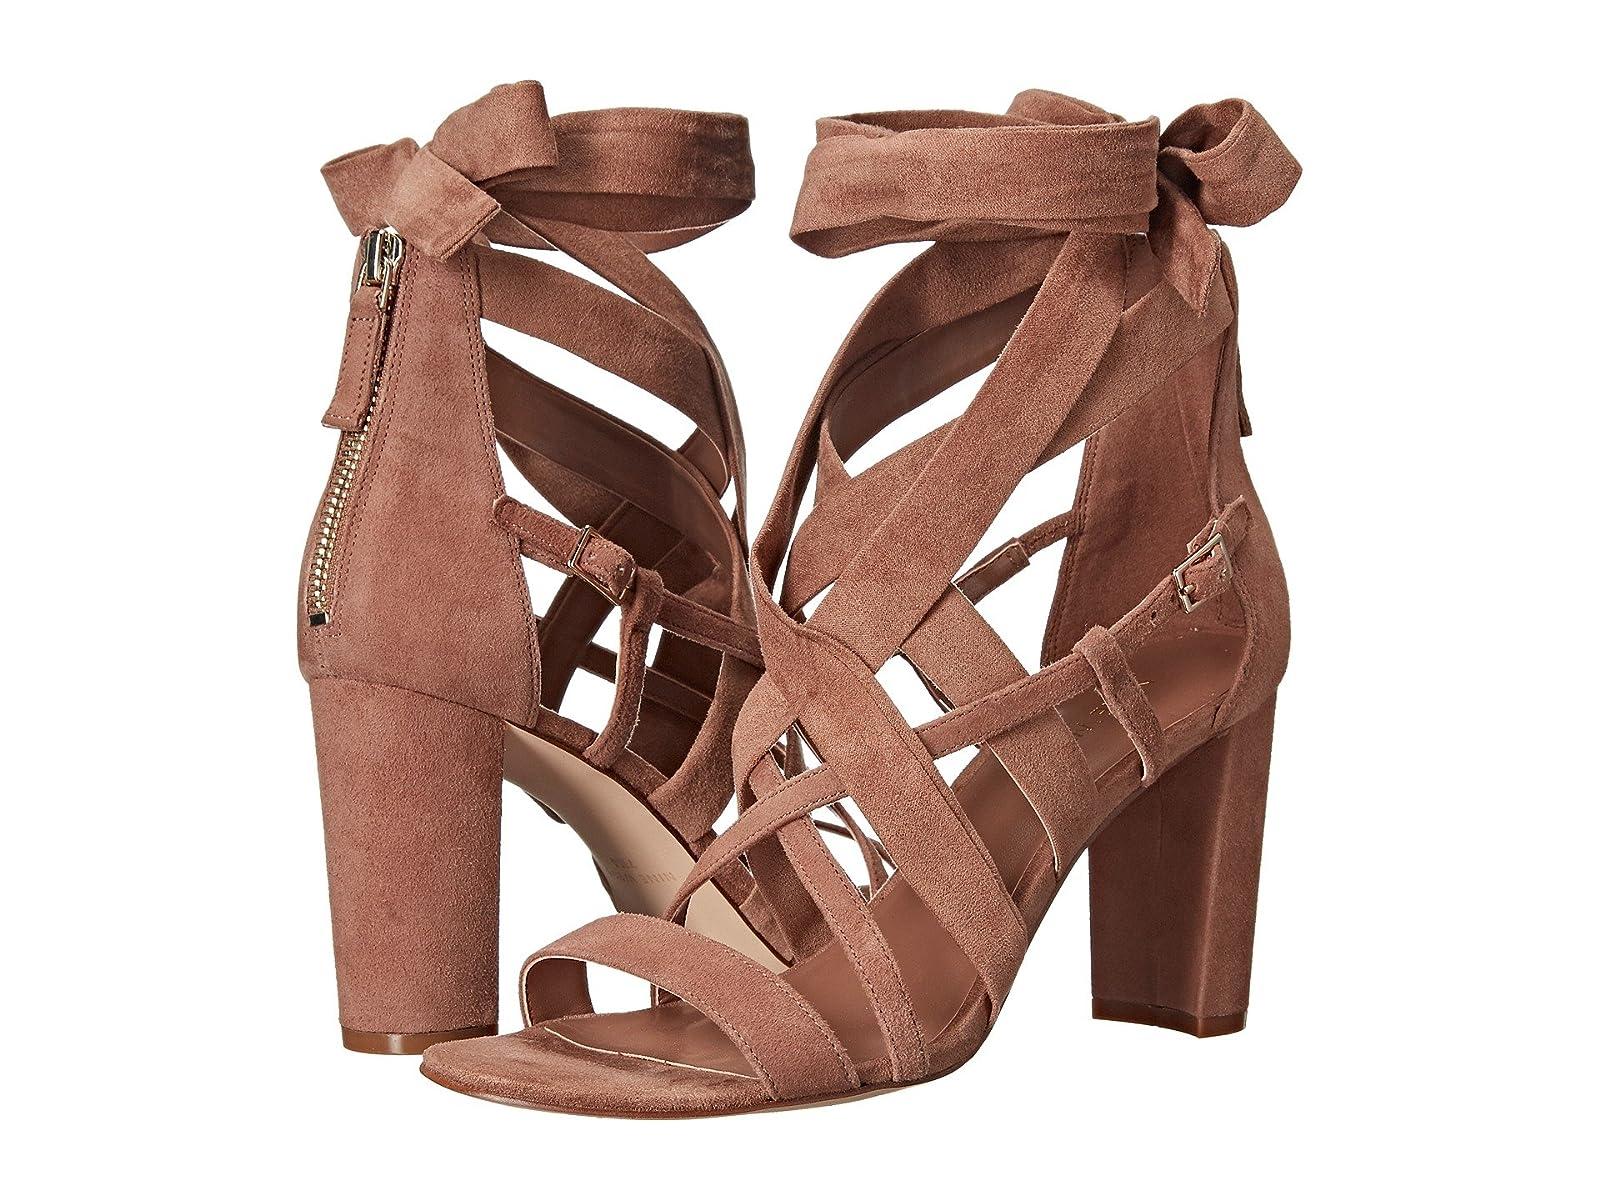 Nine West Nuru 2Cheap and distinctive eye-catching shoes